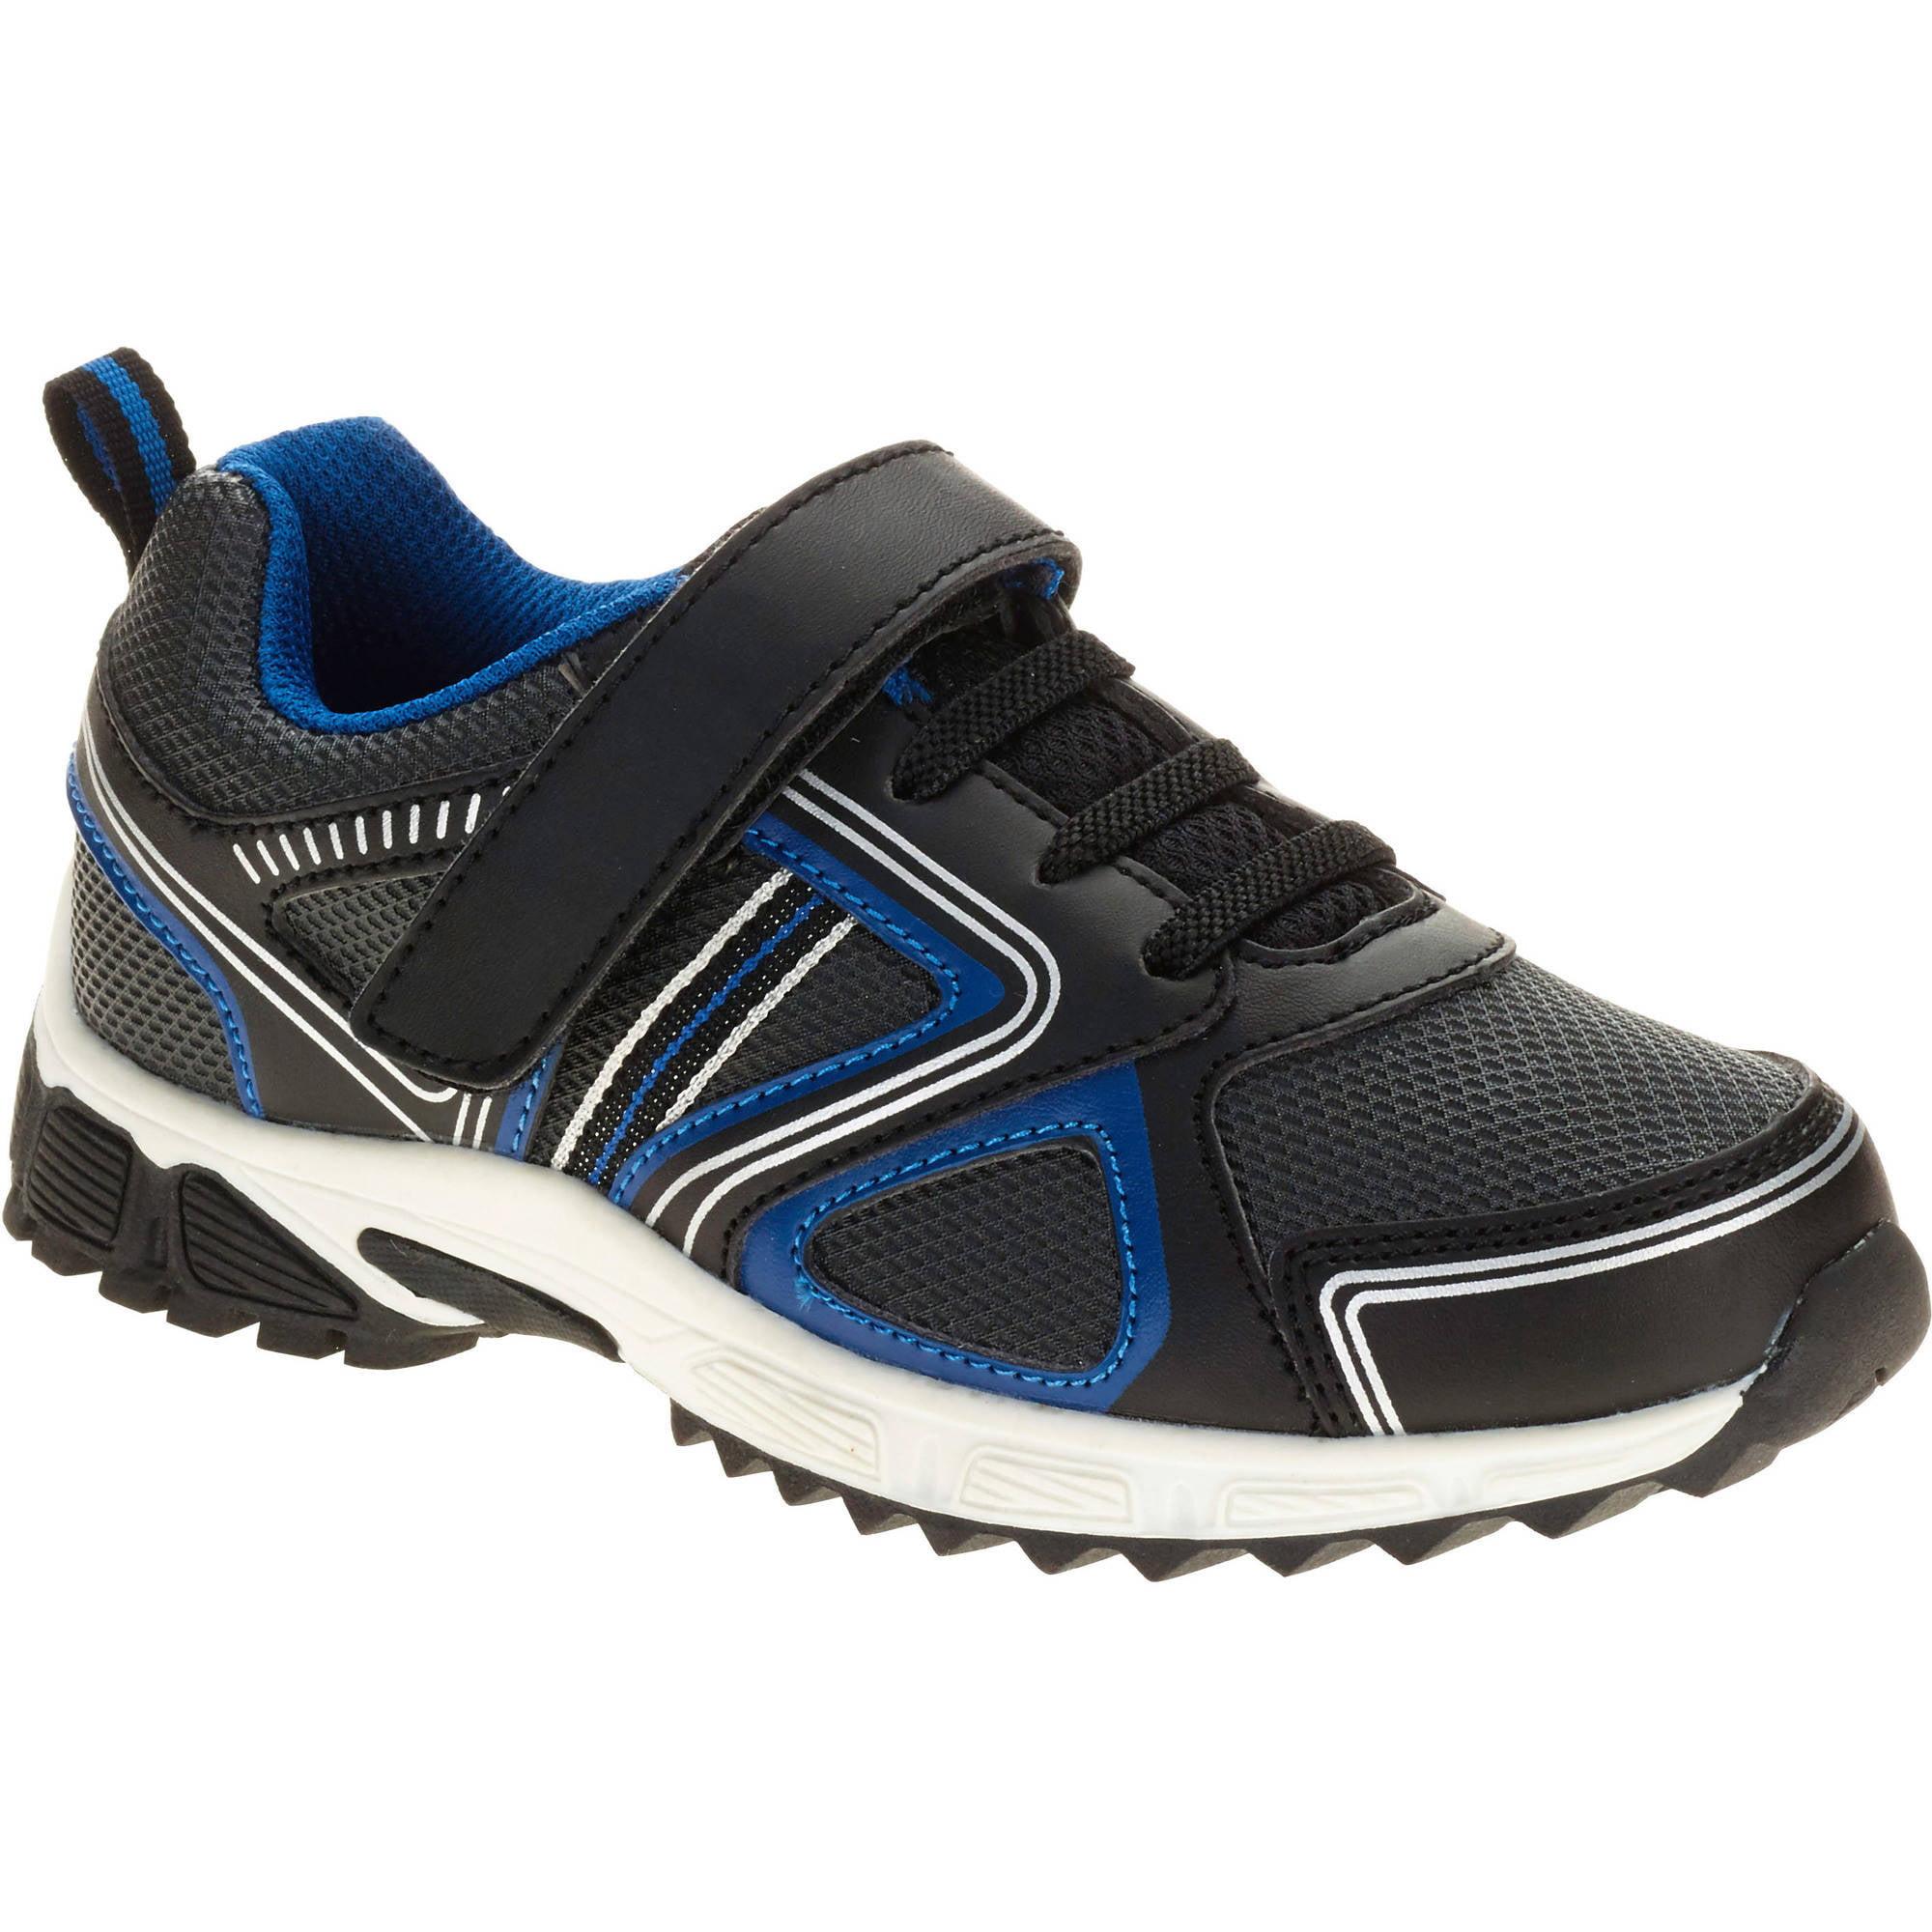 Skechers GOtrail Ultra 4 Review | Running Shoes Guru